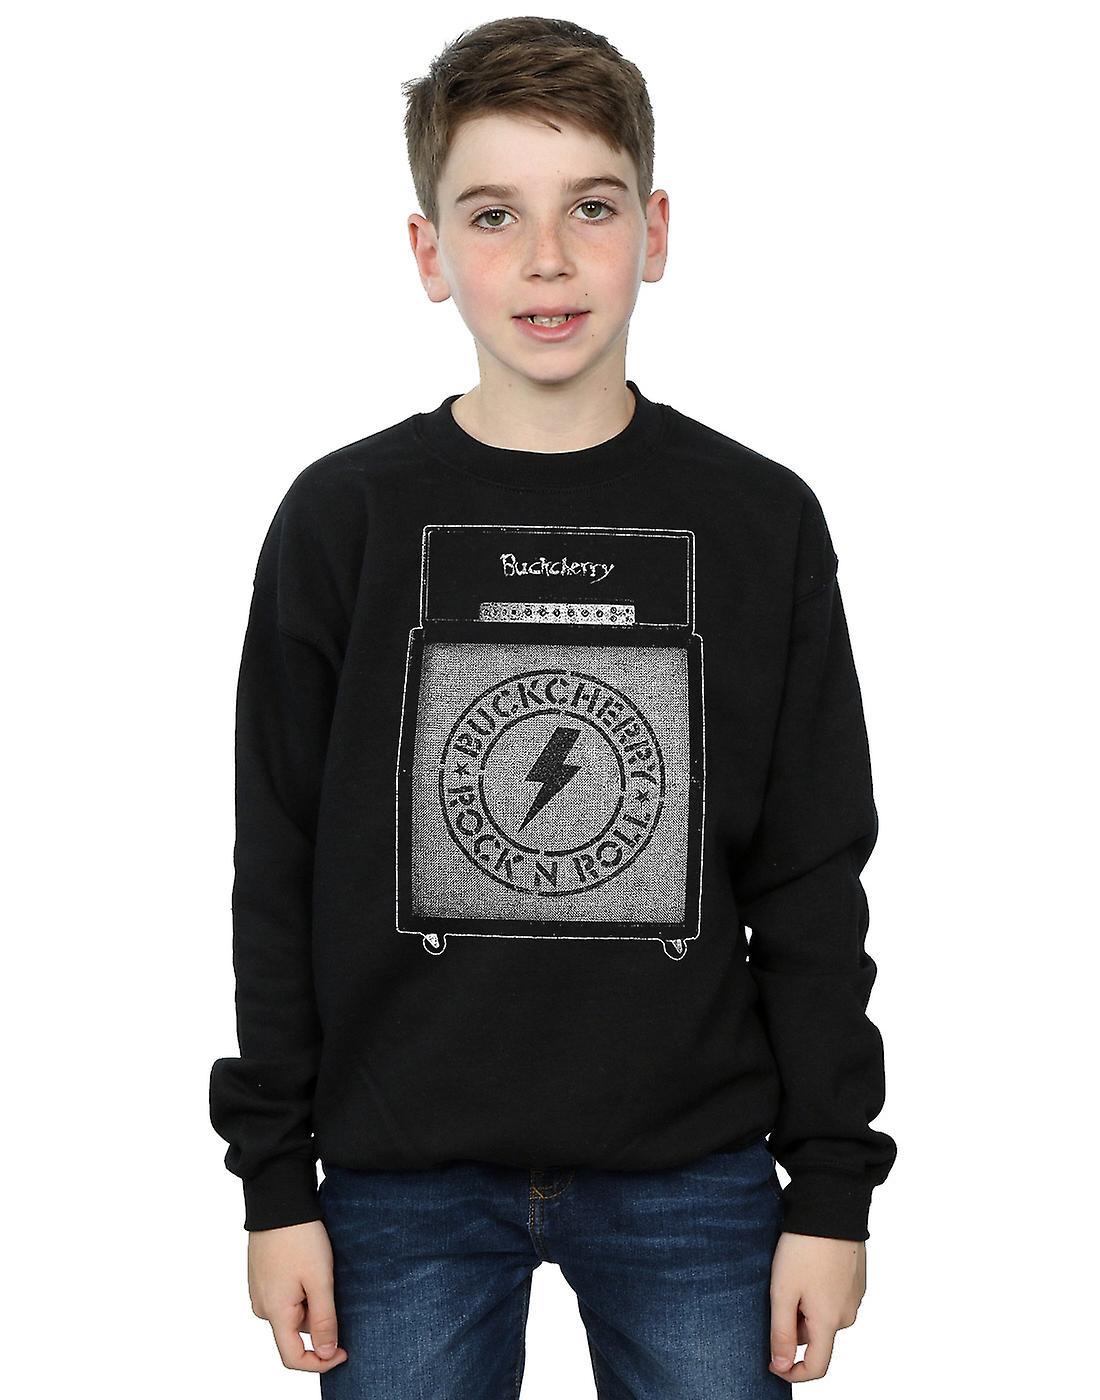 Buckcherry Boys Rock And Roll Amplifier Sweatshirt